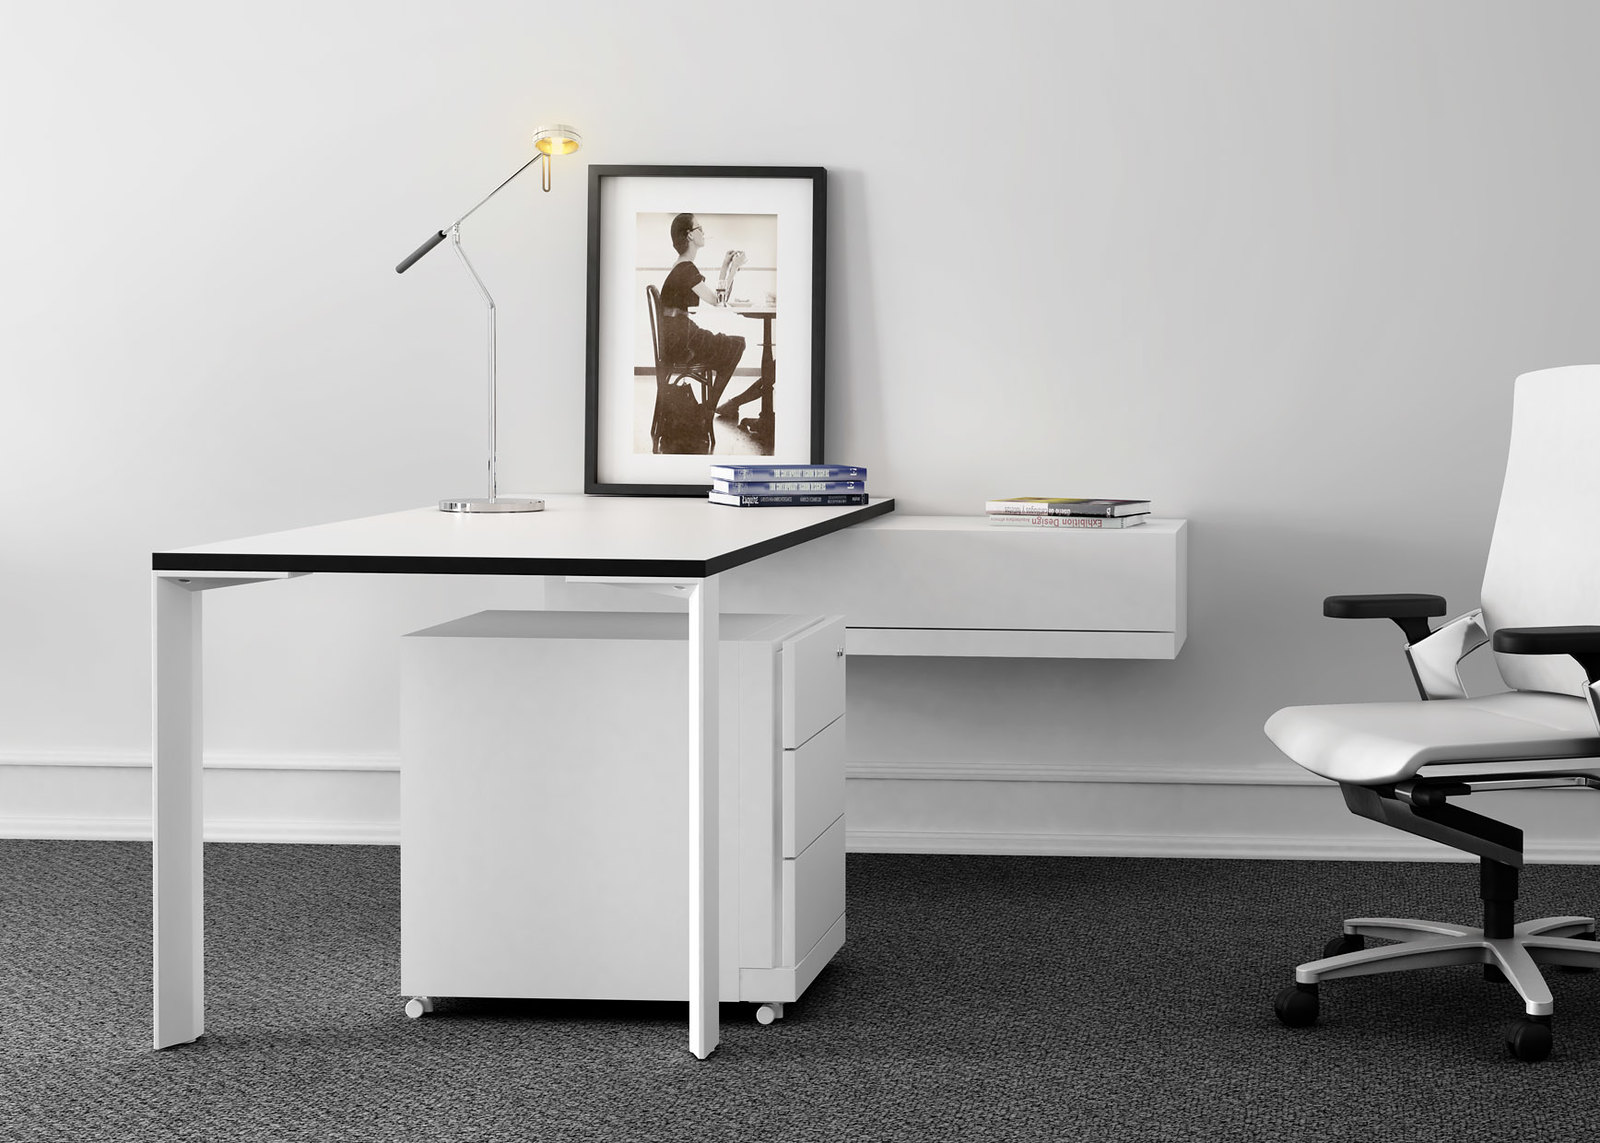 le bureau contemporain flickr. Black Bedroom Furniture Sets. Home Design Ideas